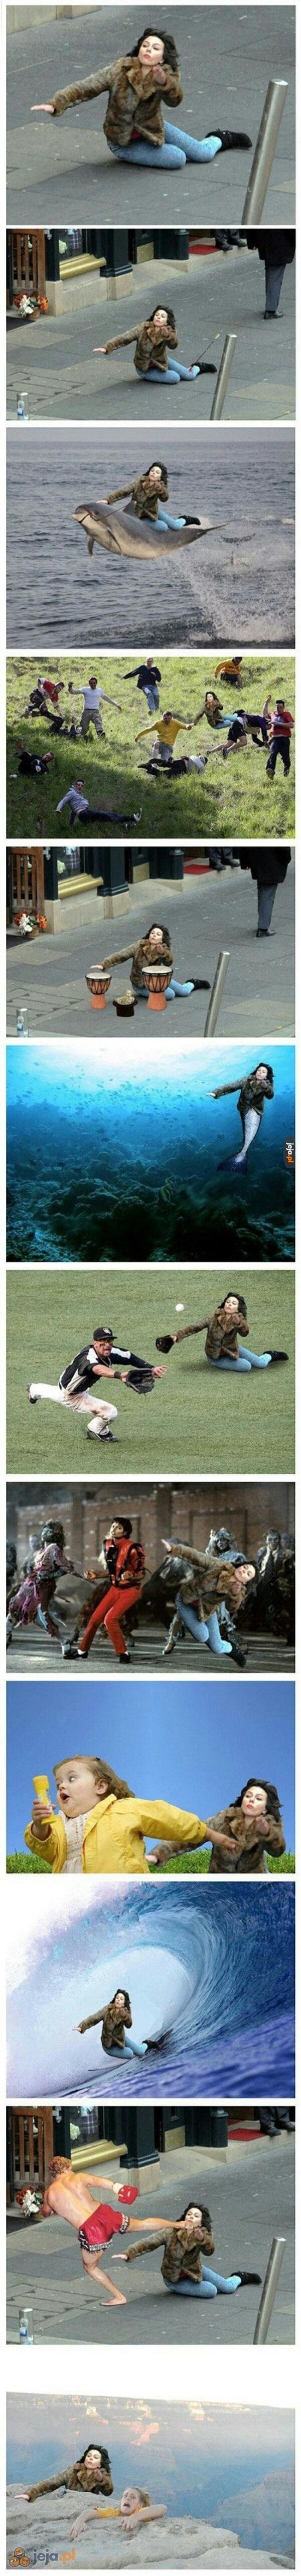 Scarlet Johansson vs Photoshop